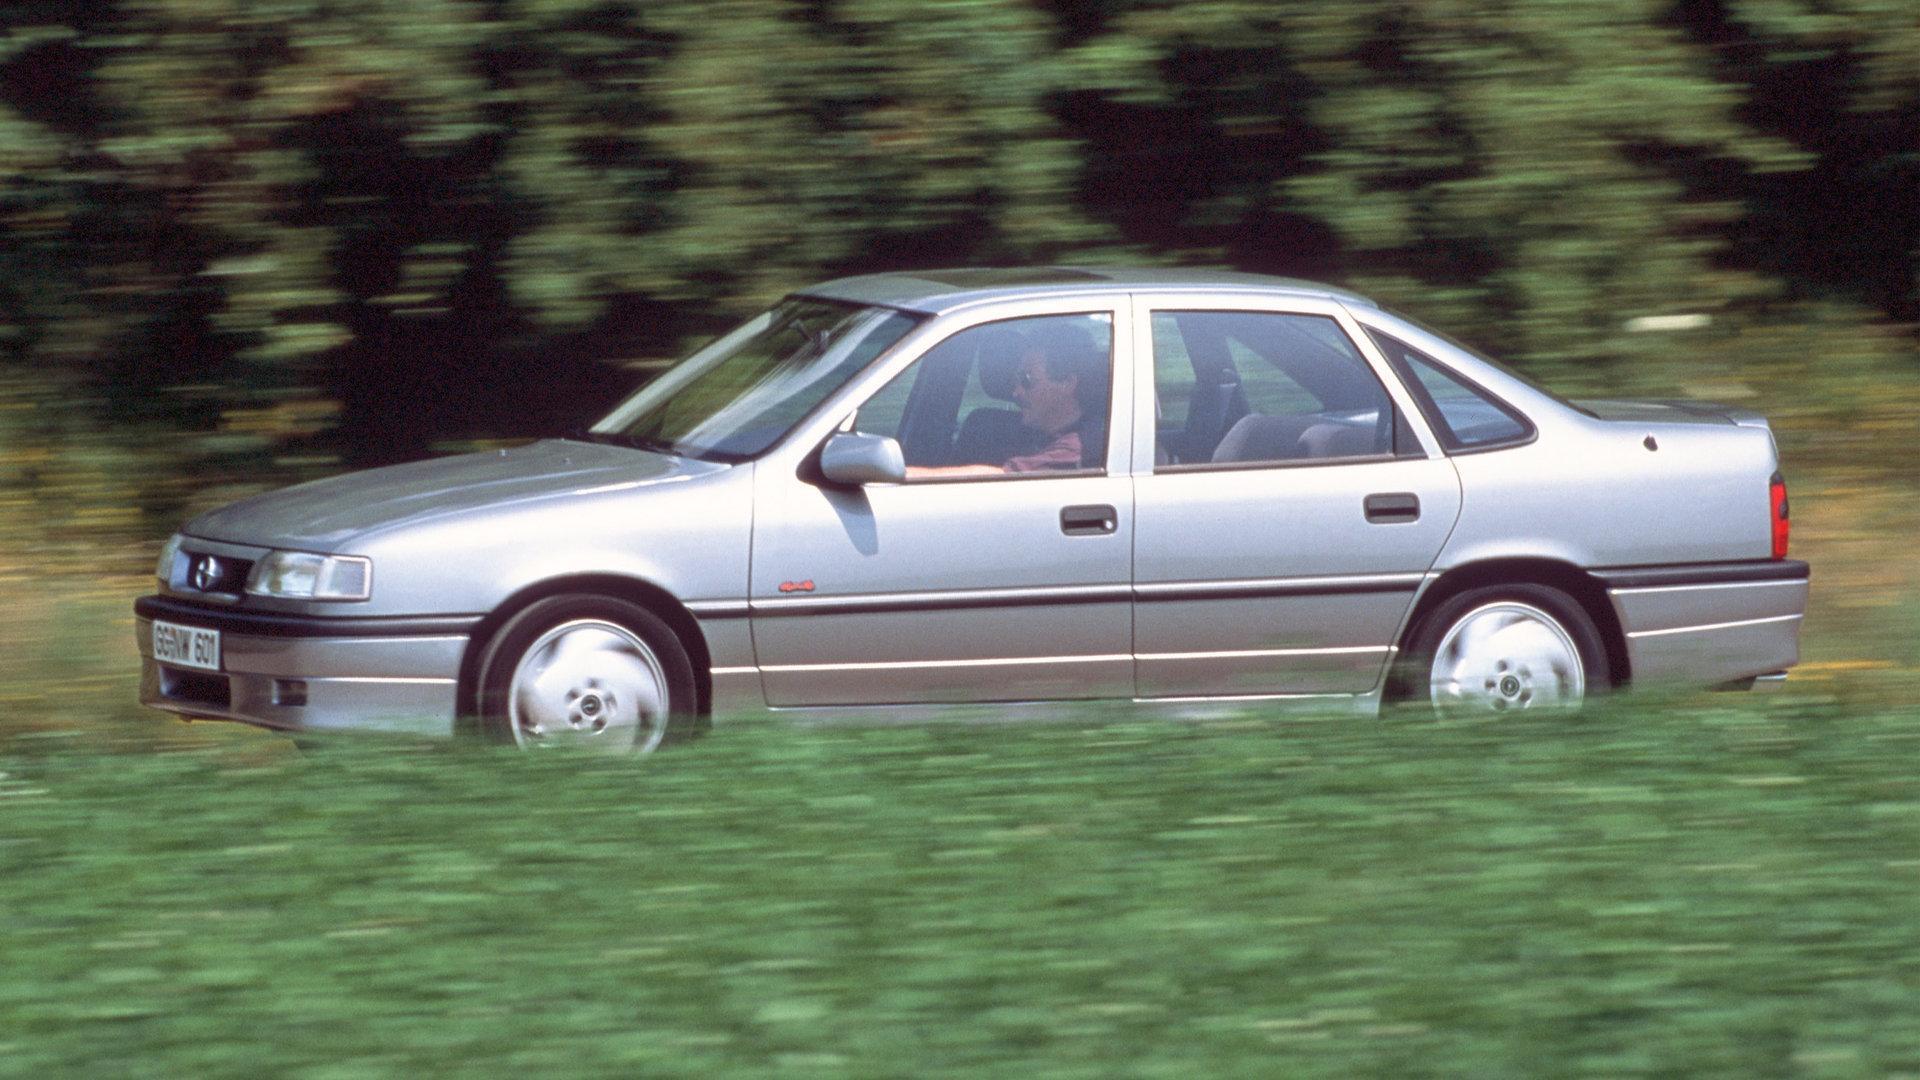 Opel Vectra A Turbo 4x4 2